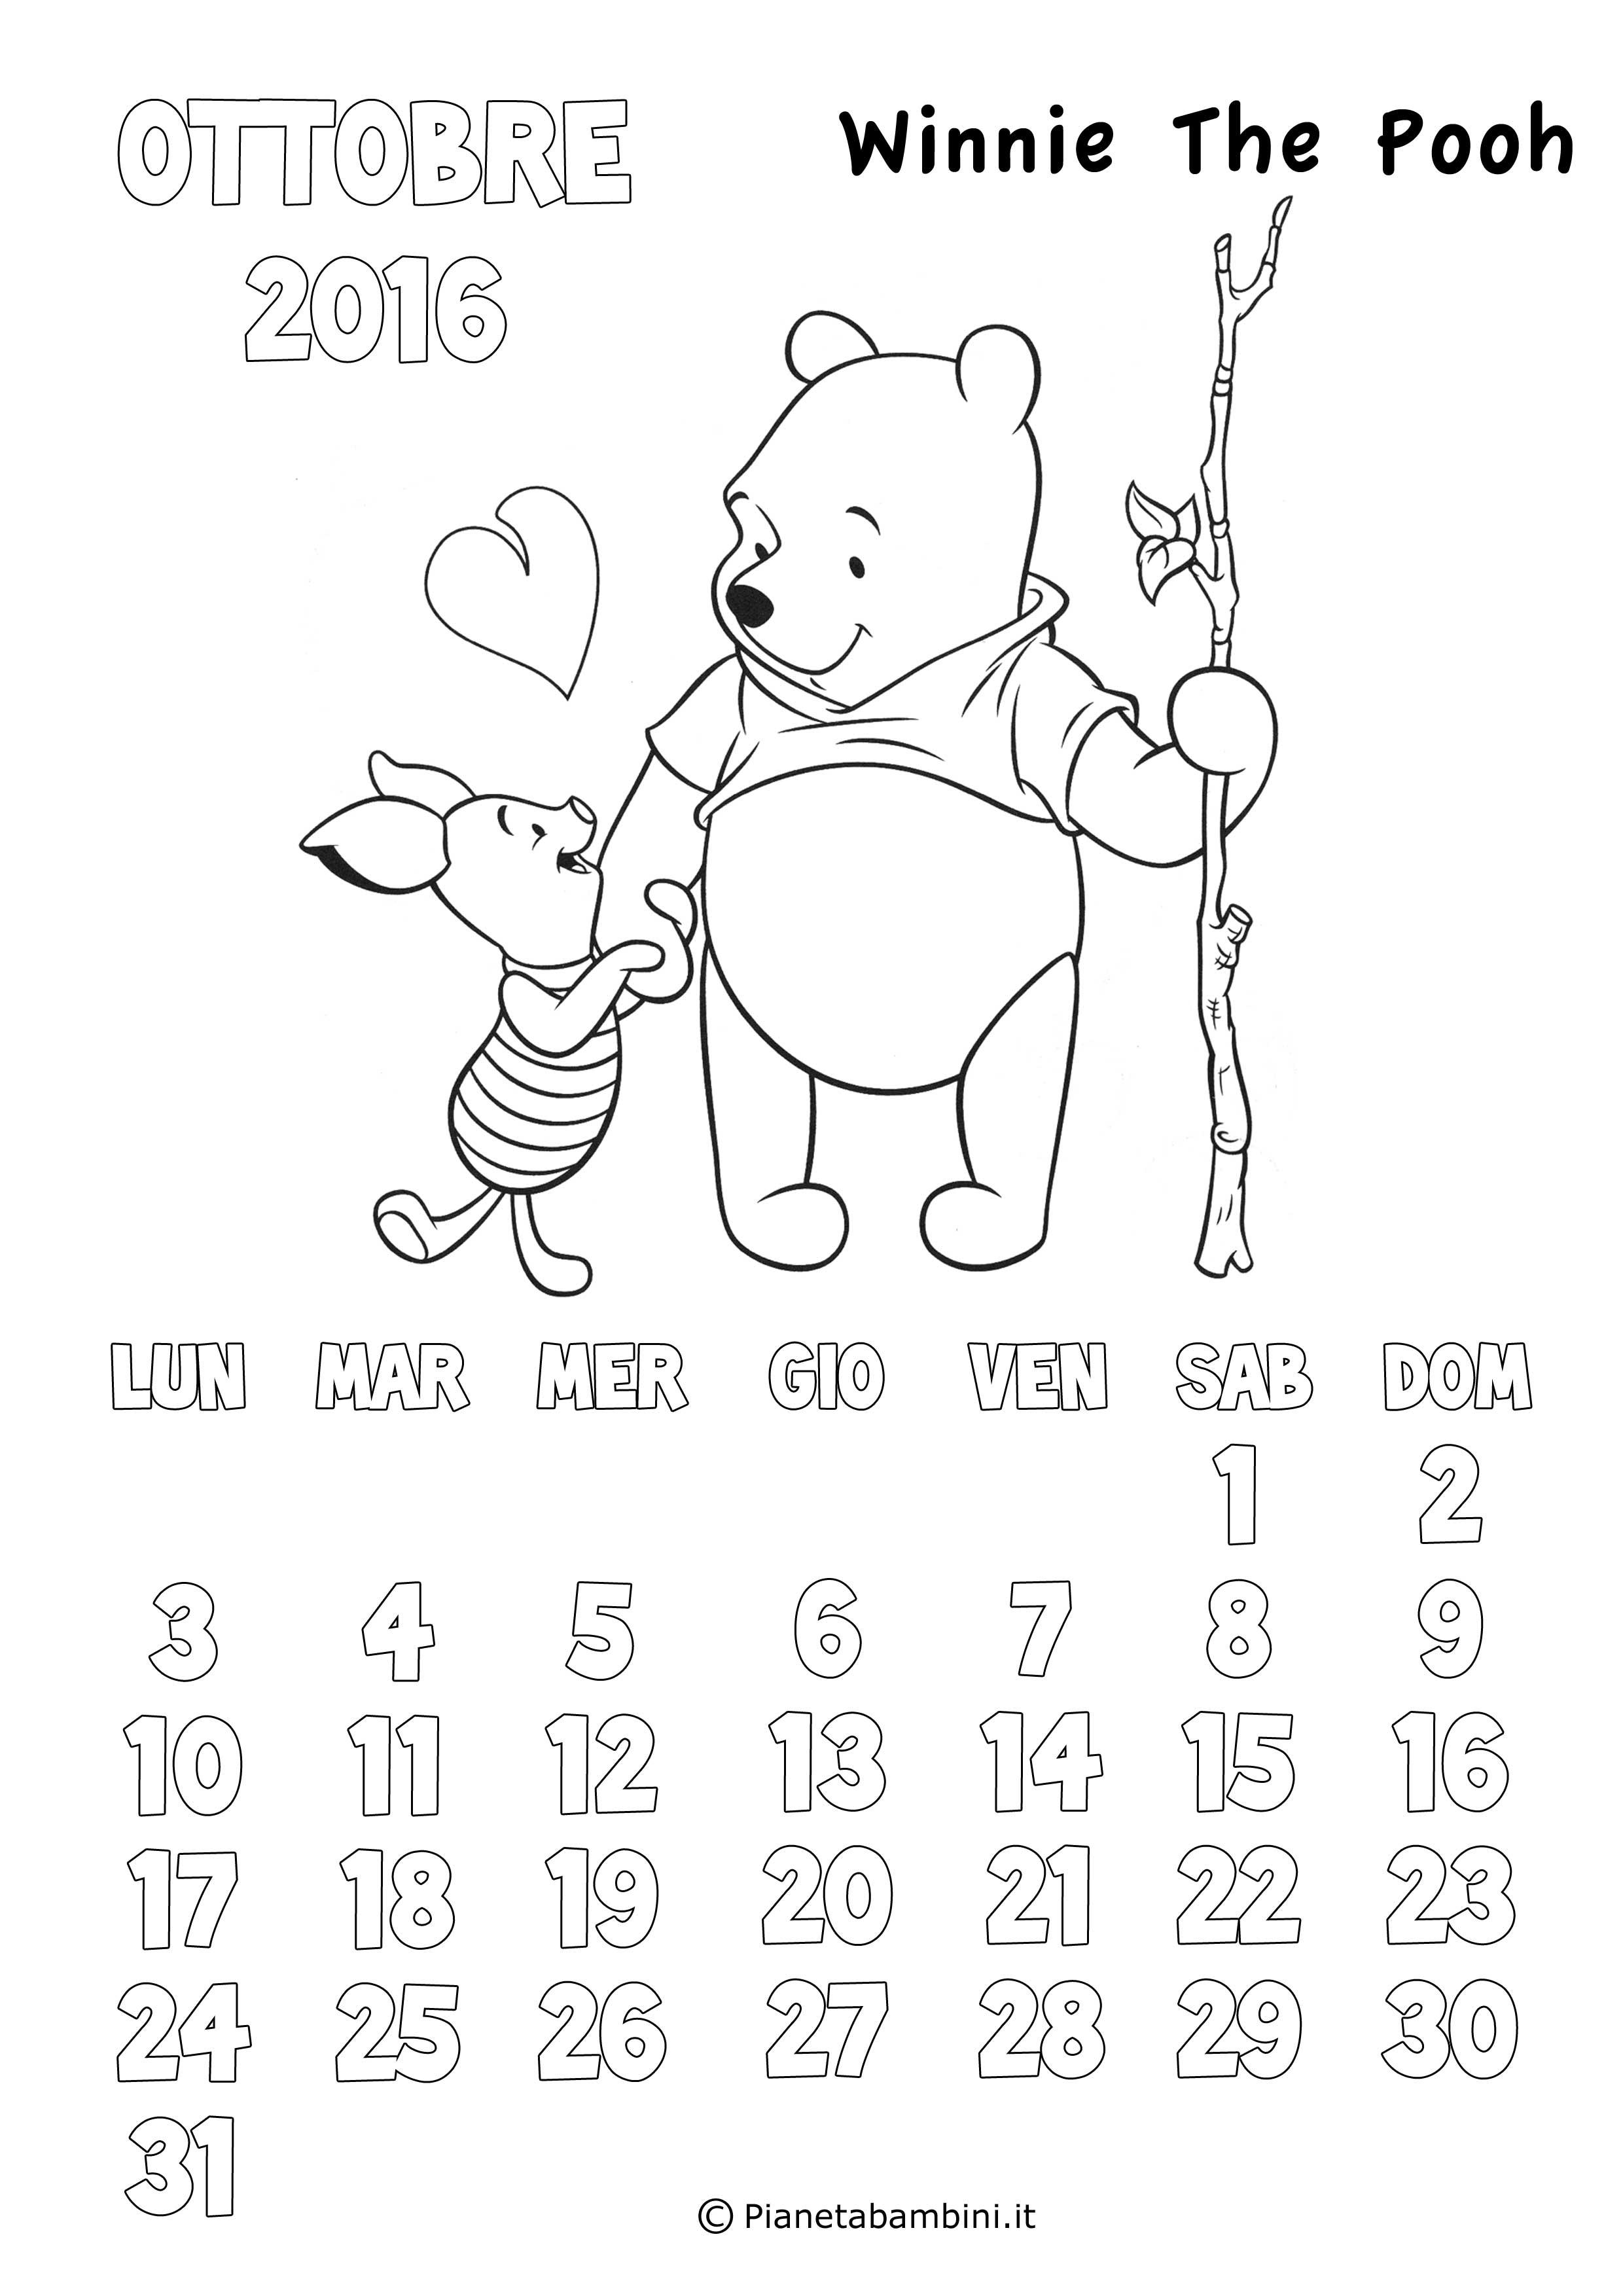 Ottobre-2016-Winnie-Pooh